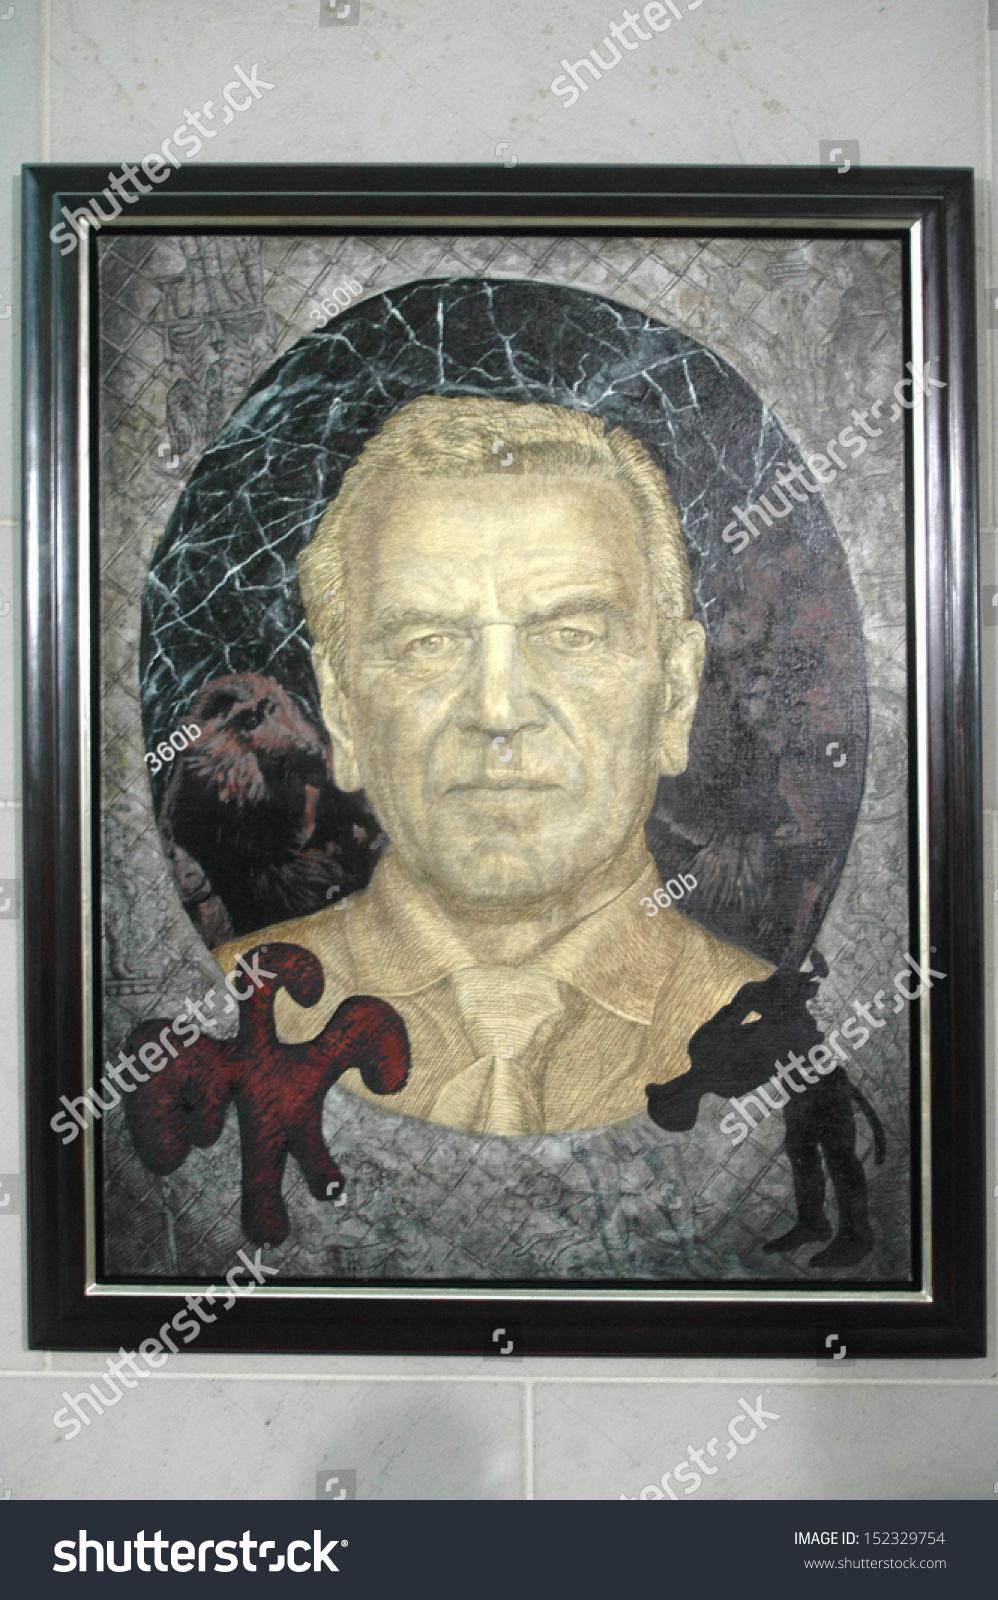 july 10 2007 berlin the official portrait painting of former chancellor gerhard schroder - Gerhard Schroder Lebenslauf